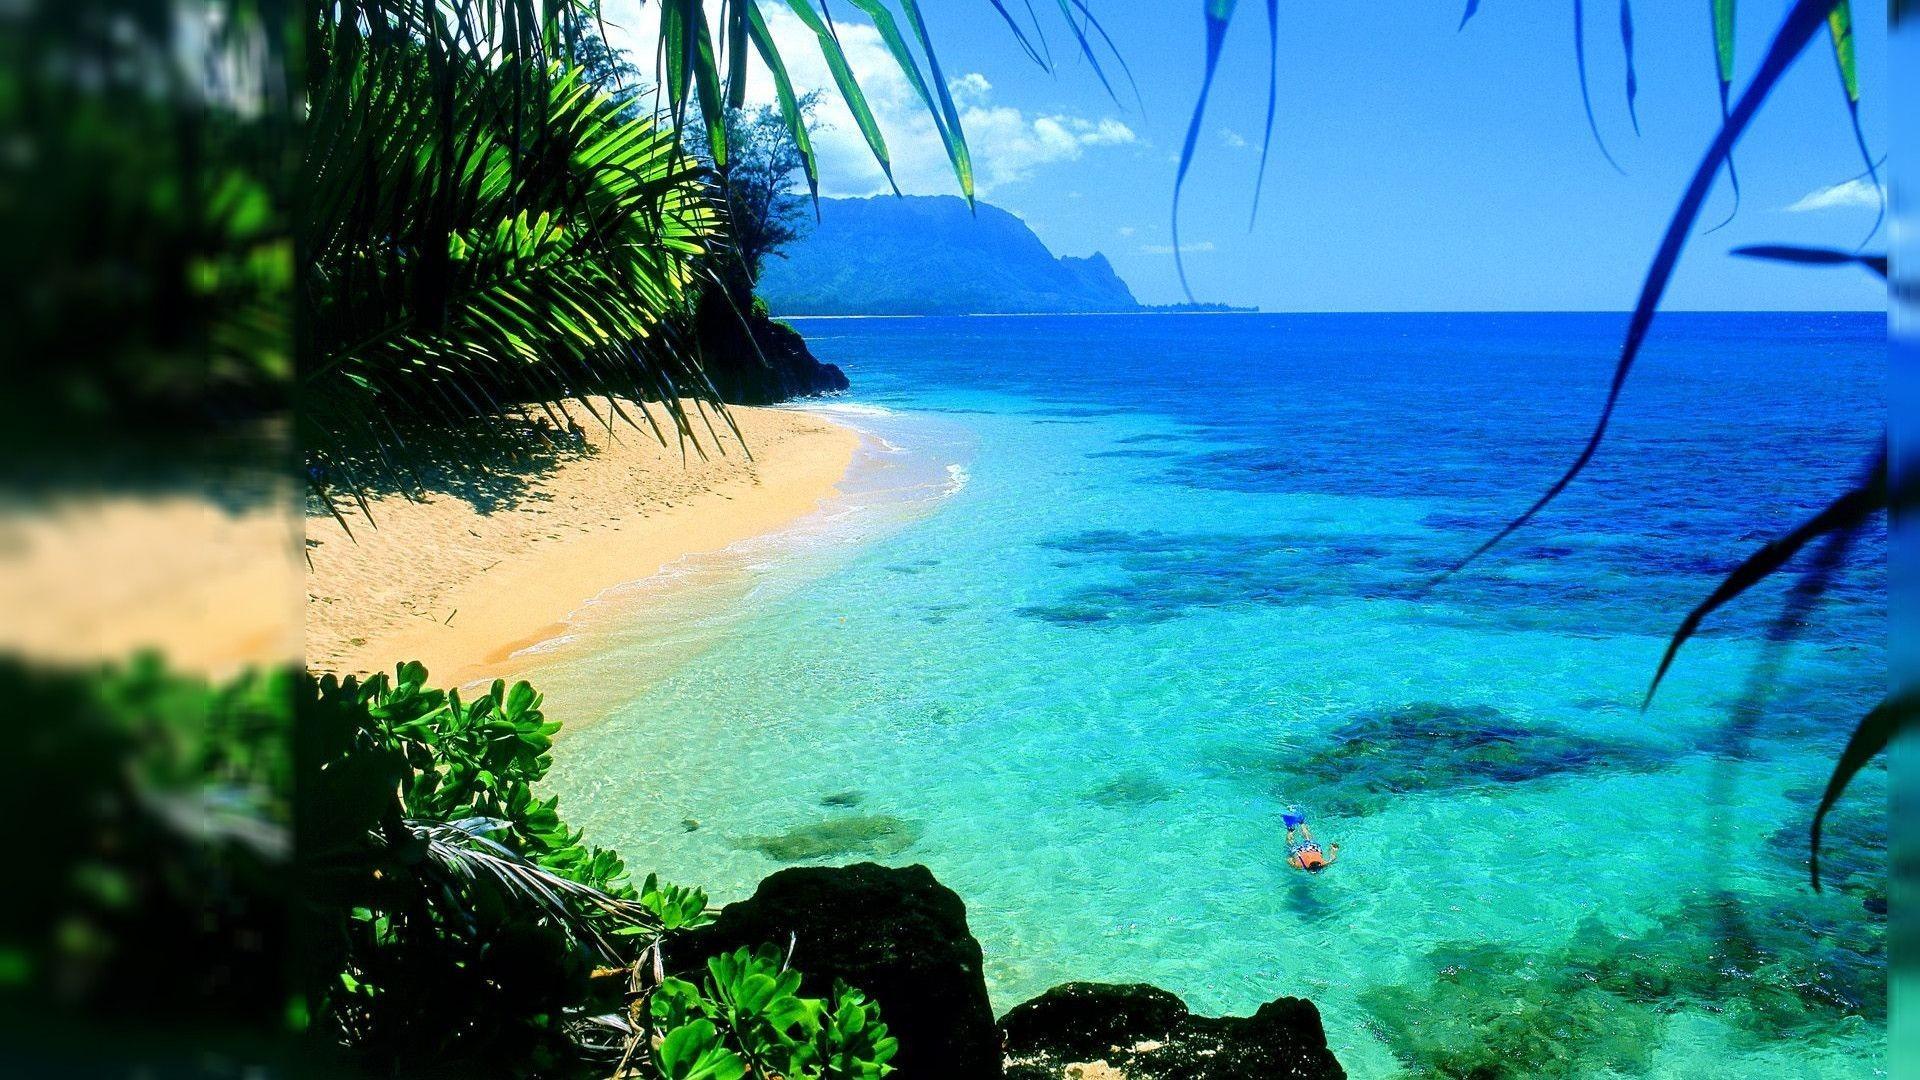 … hawaii wallpapers lyhy com …